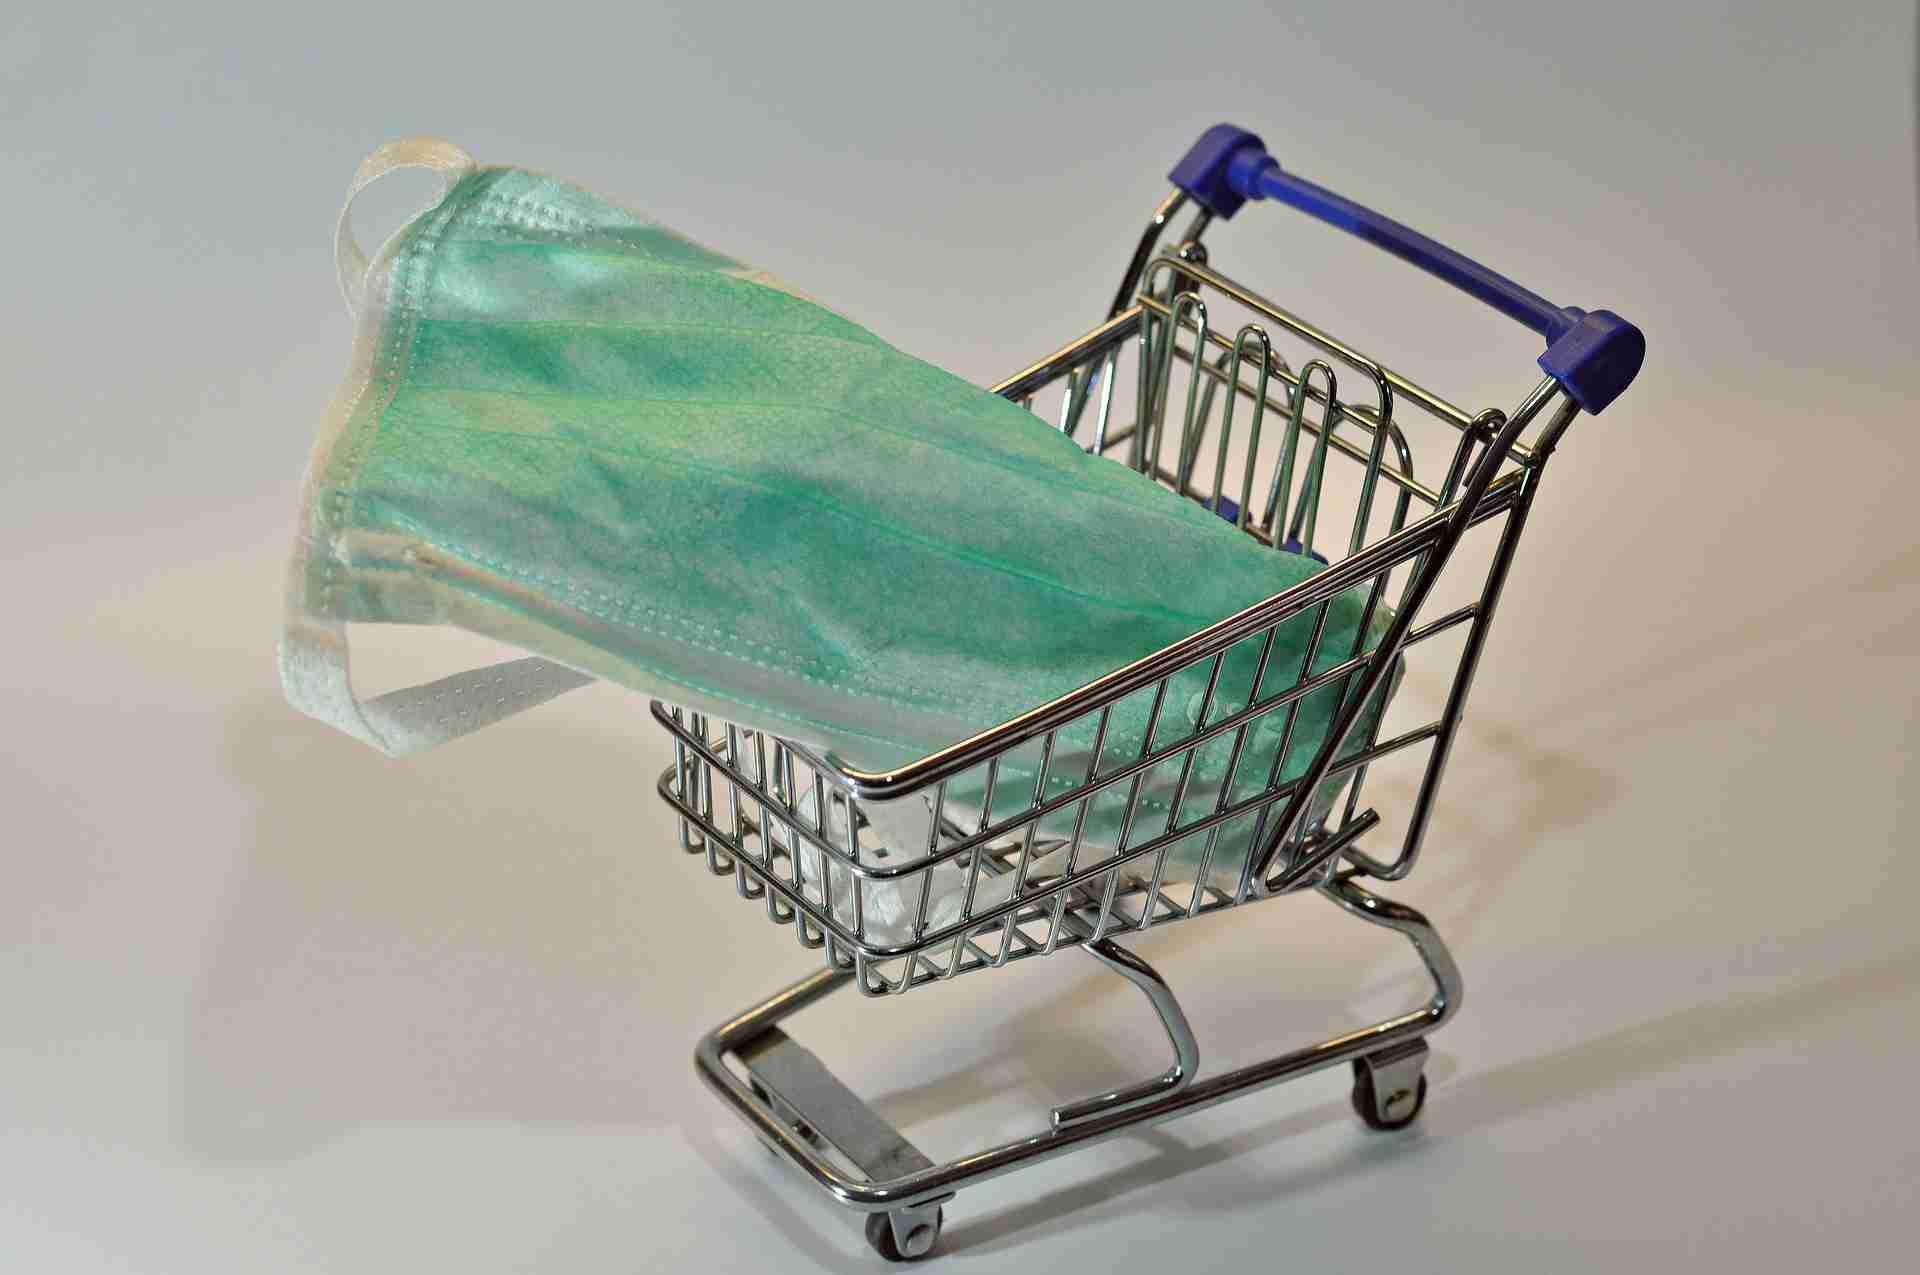 Corona Supermarkt Regeln